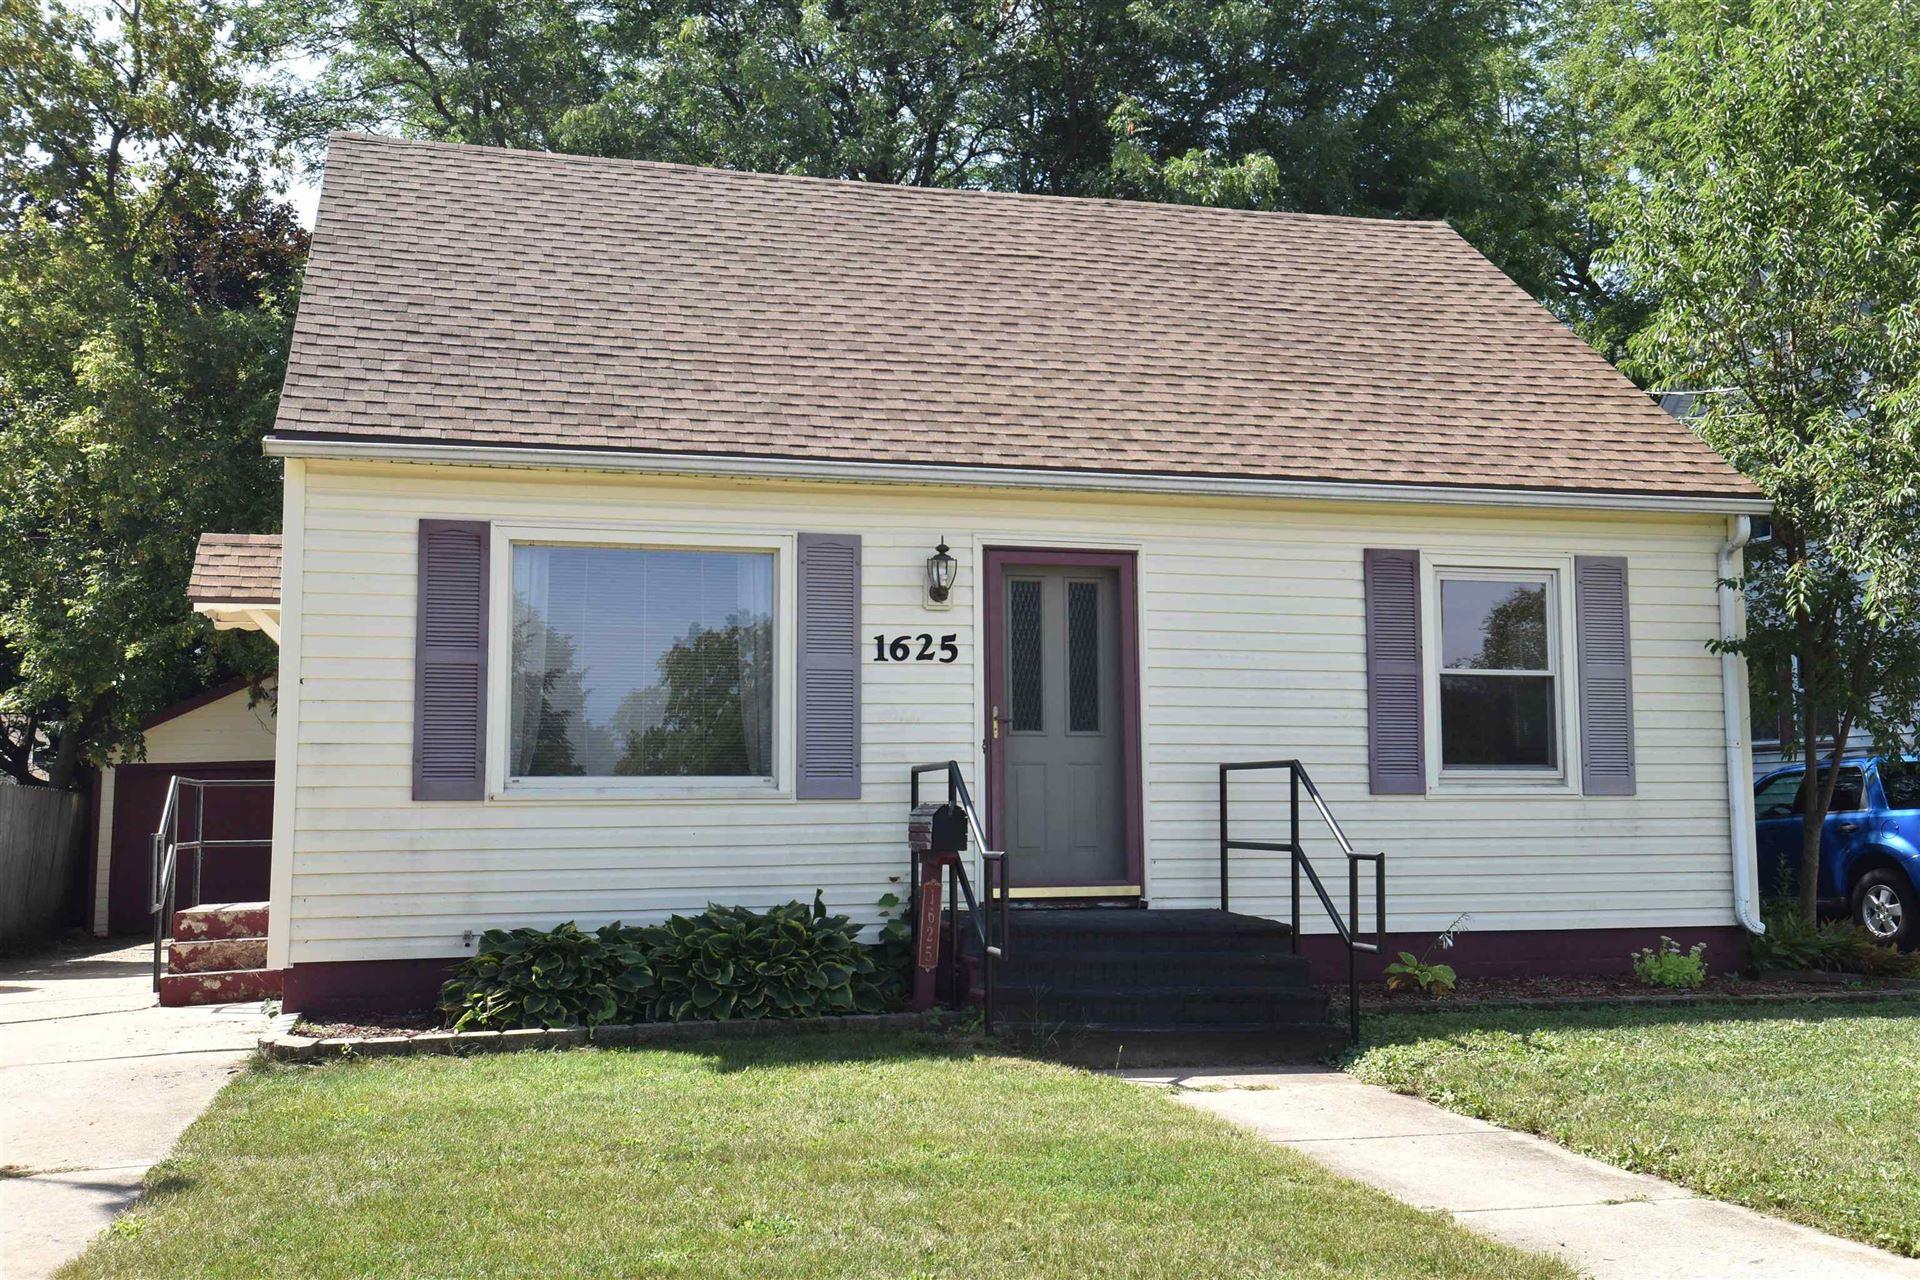 1625 Linden Ave, Janesville, WI 53548 - #: 1918199